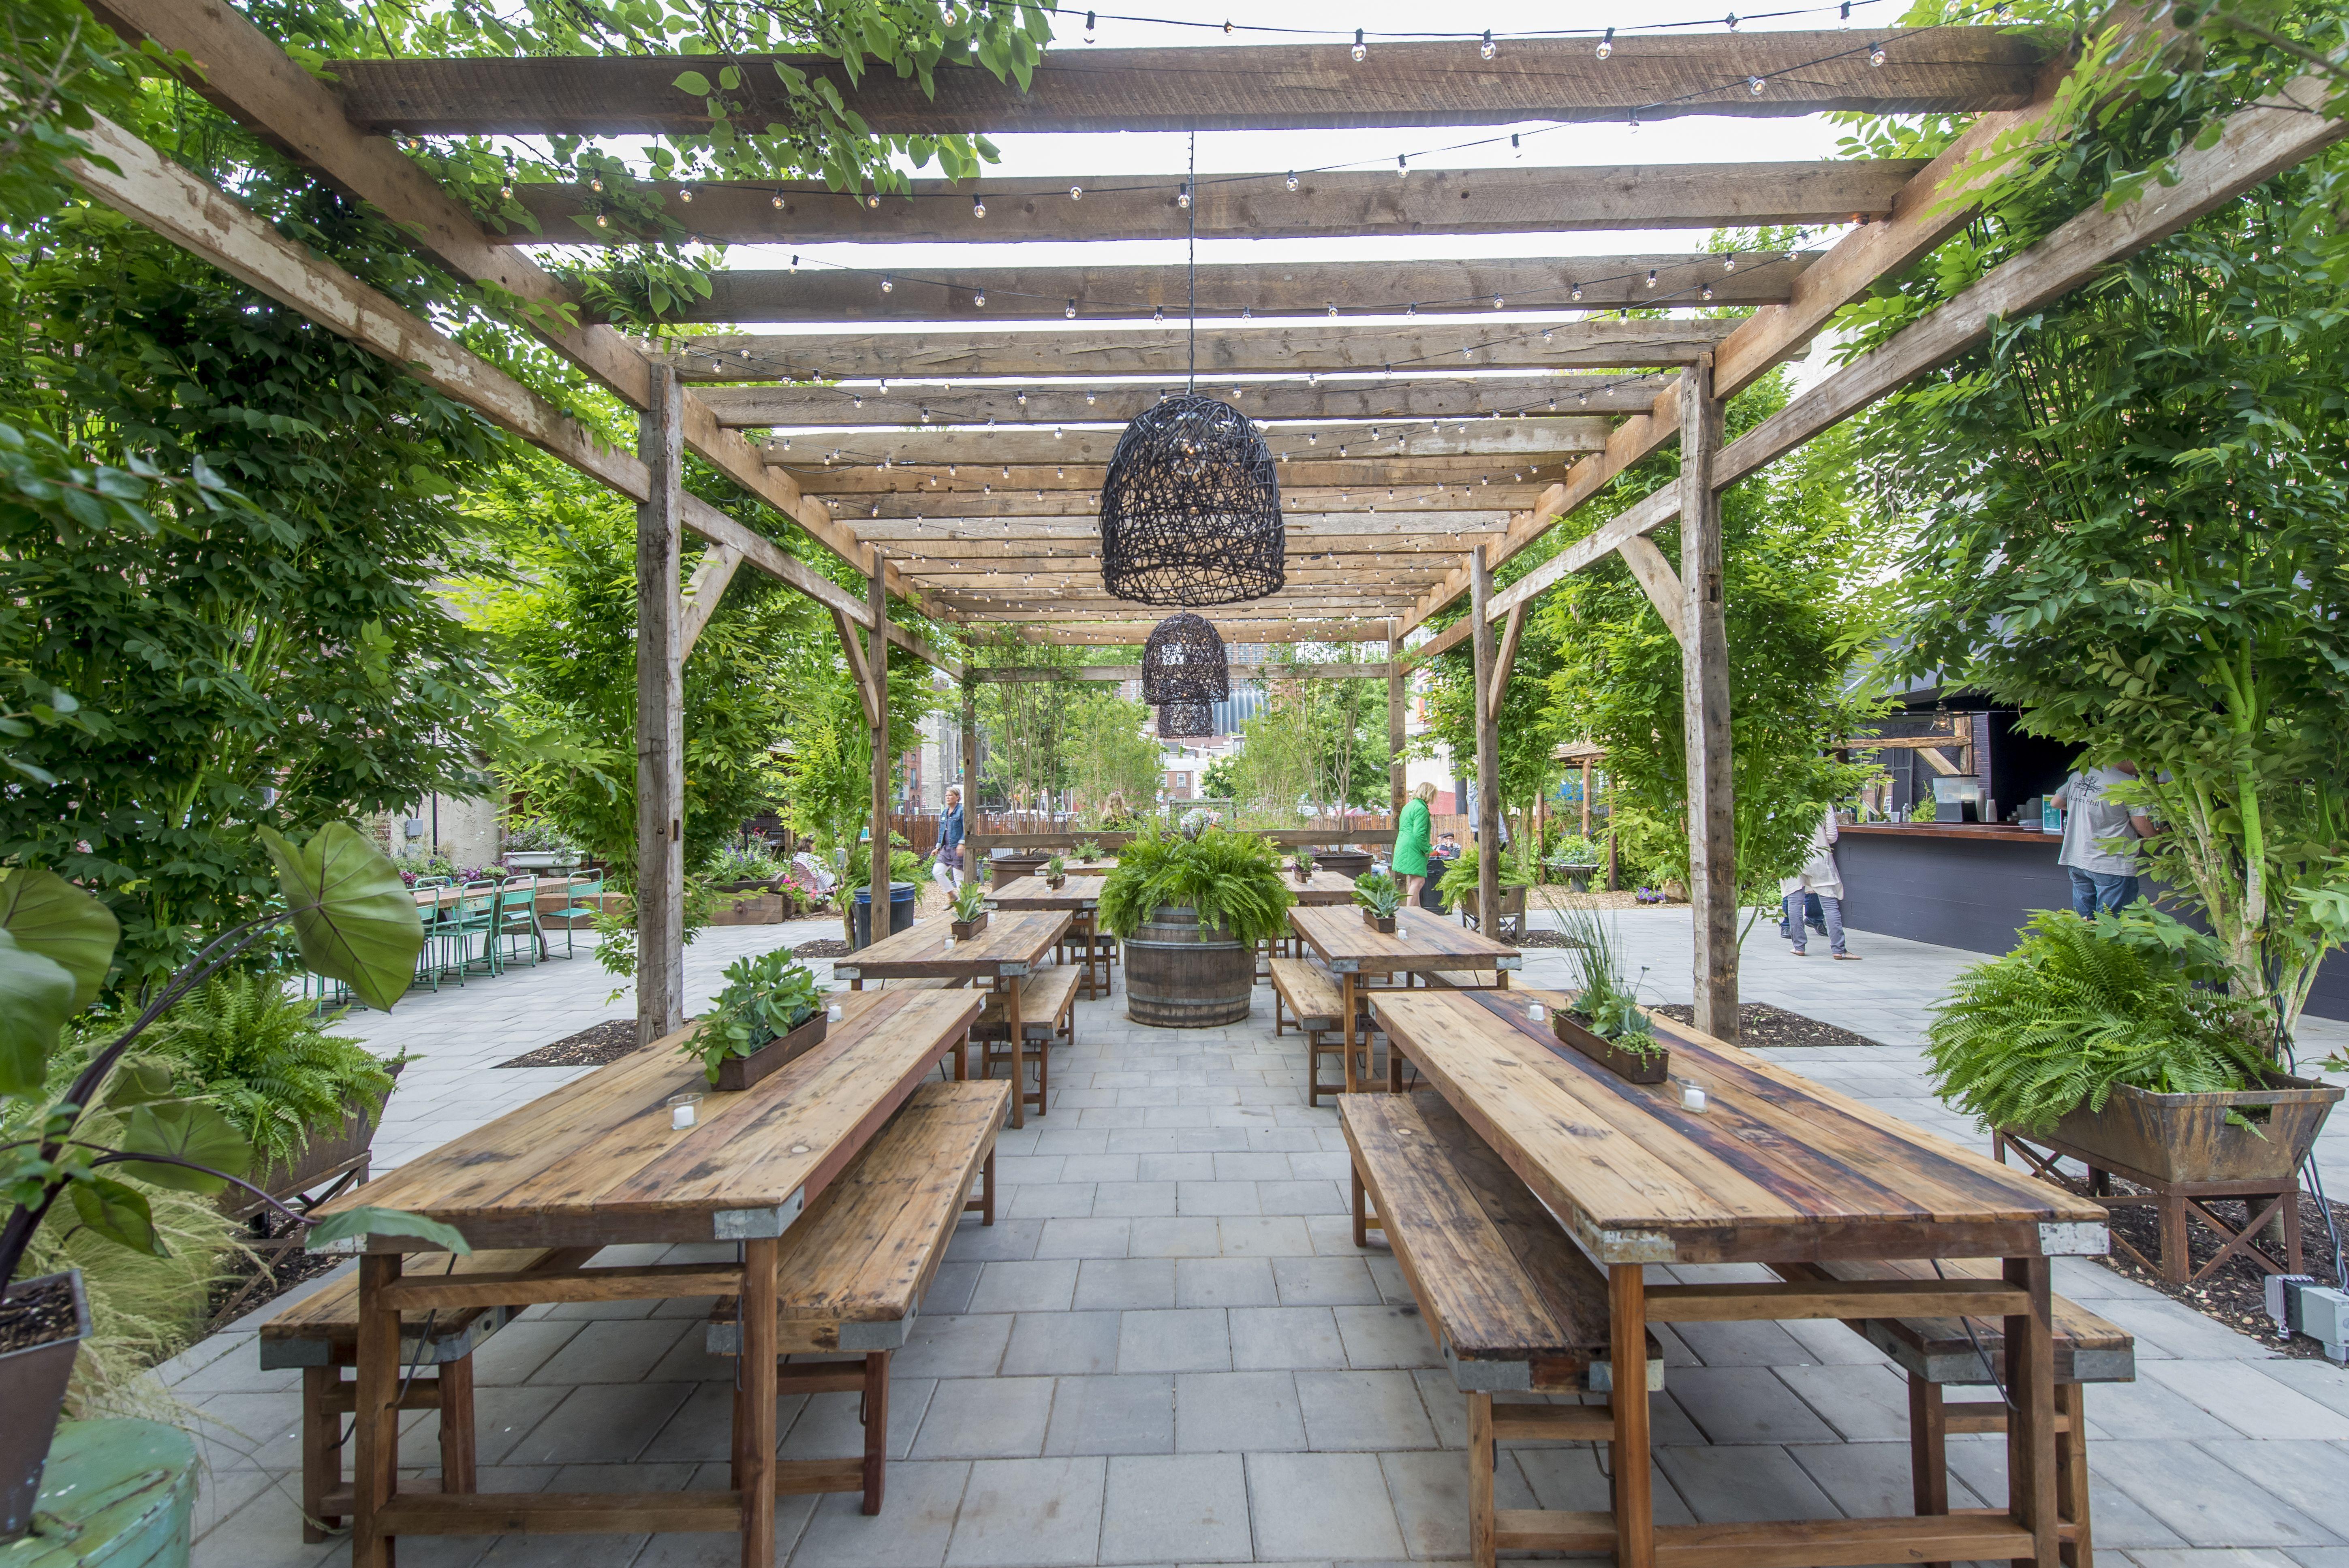 Pin On Coffee Shops Backyard garden healthy drinks cafe